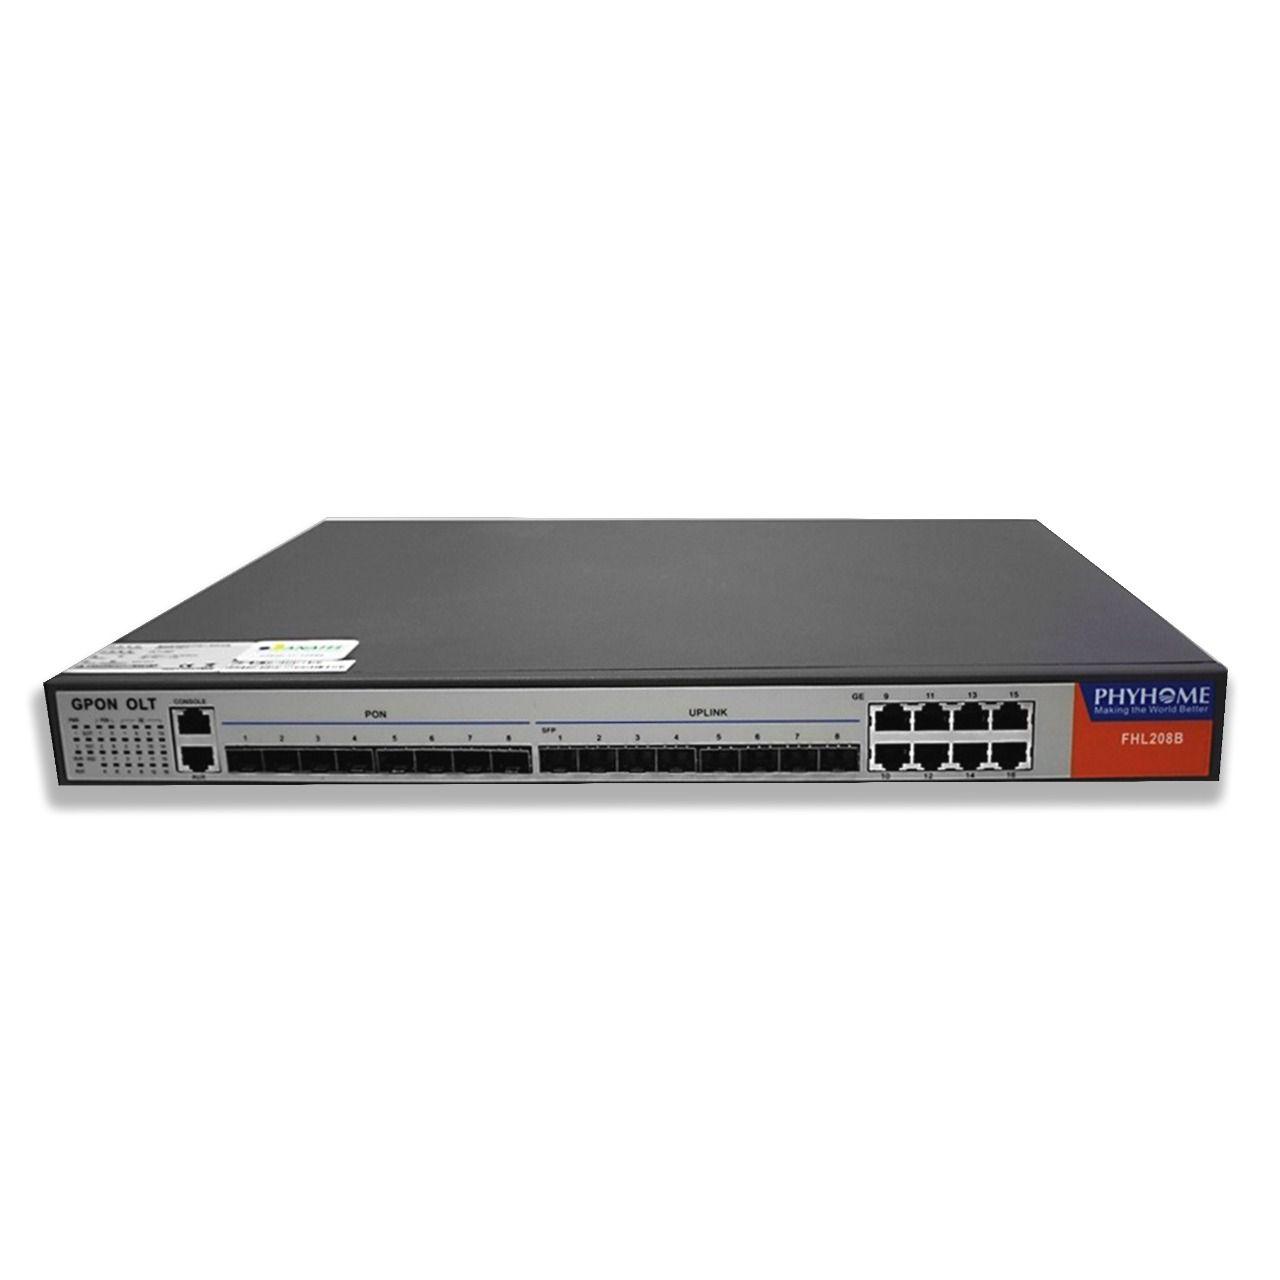 OLT GPON FHL208B Anatel 03830-17-10489 COMPLETA